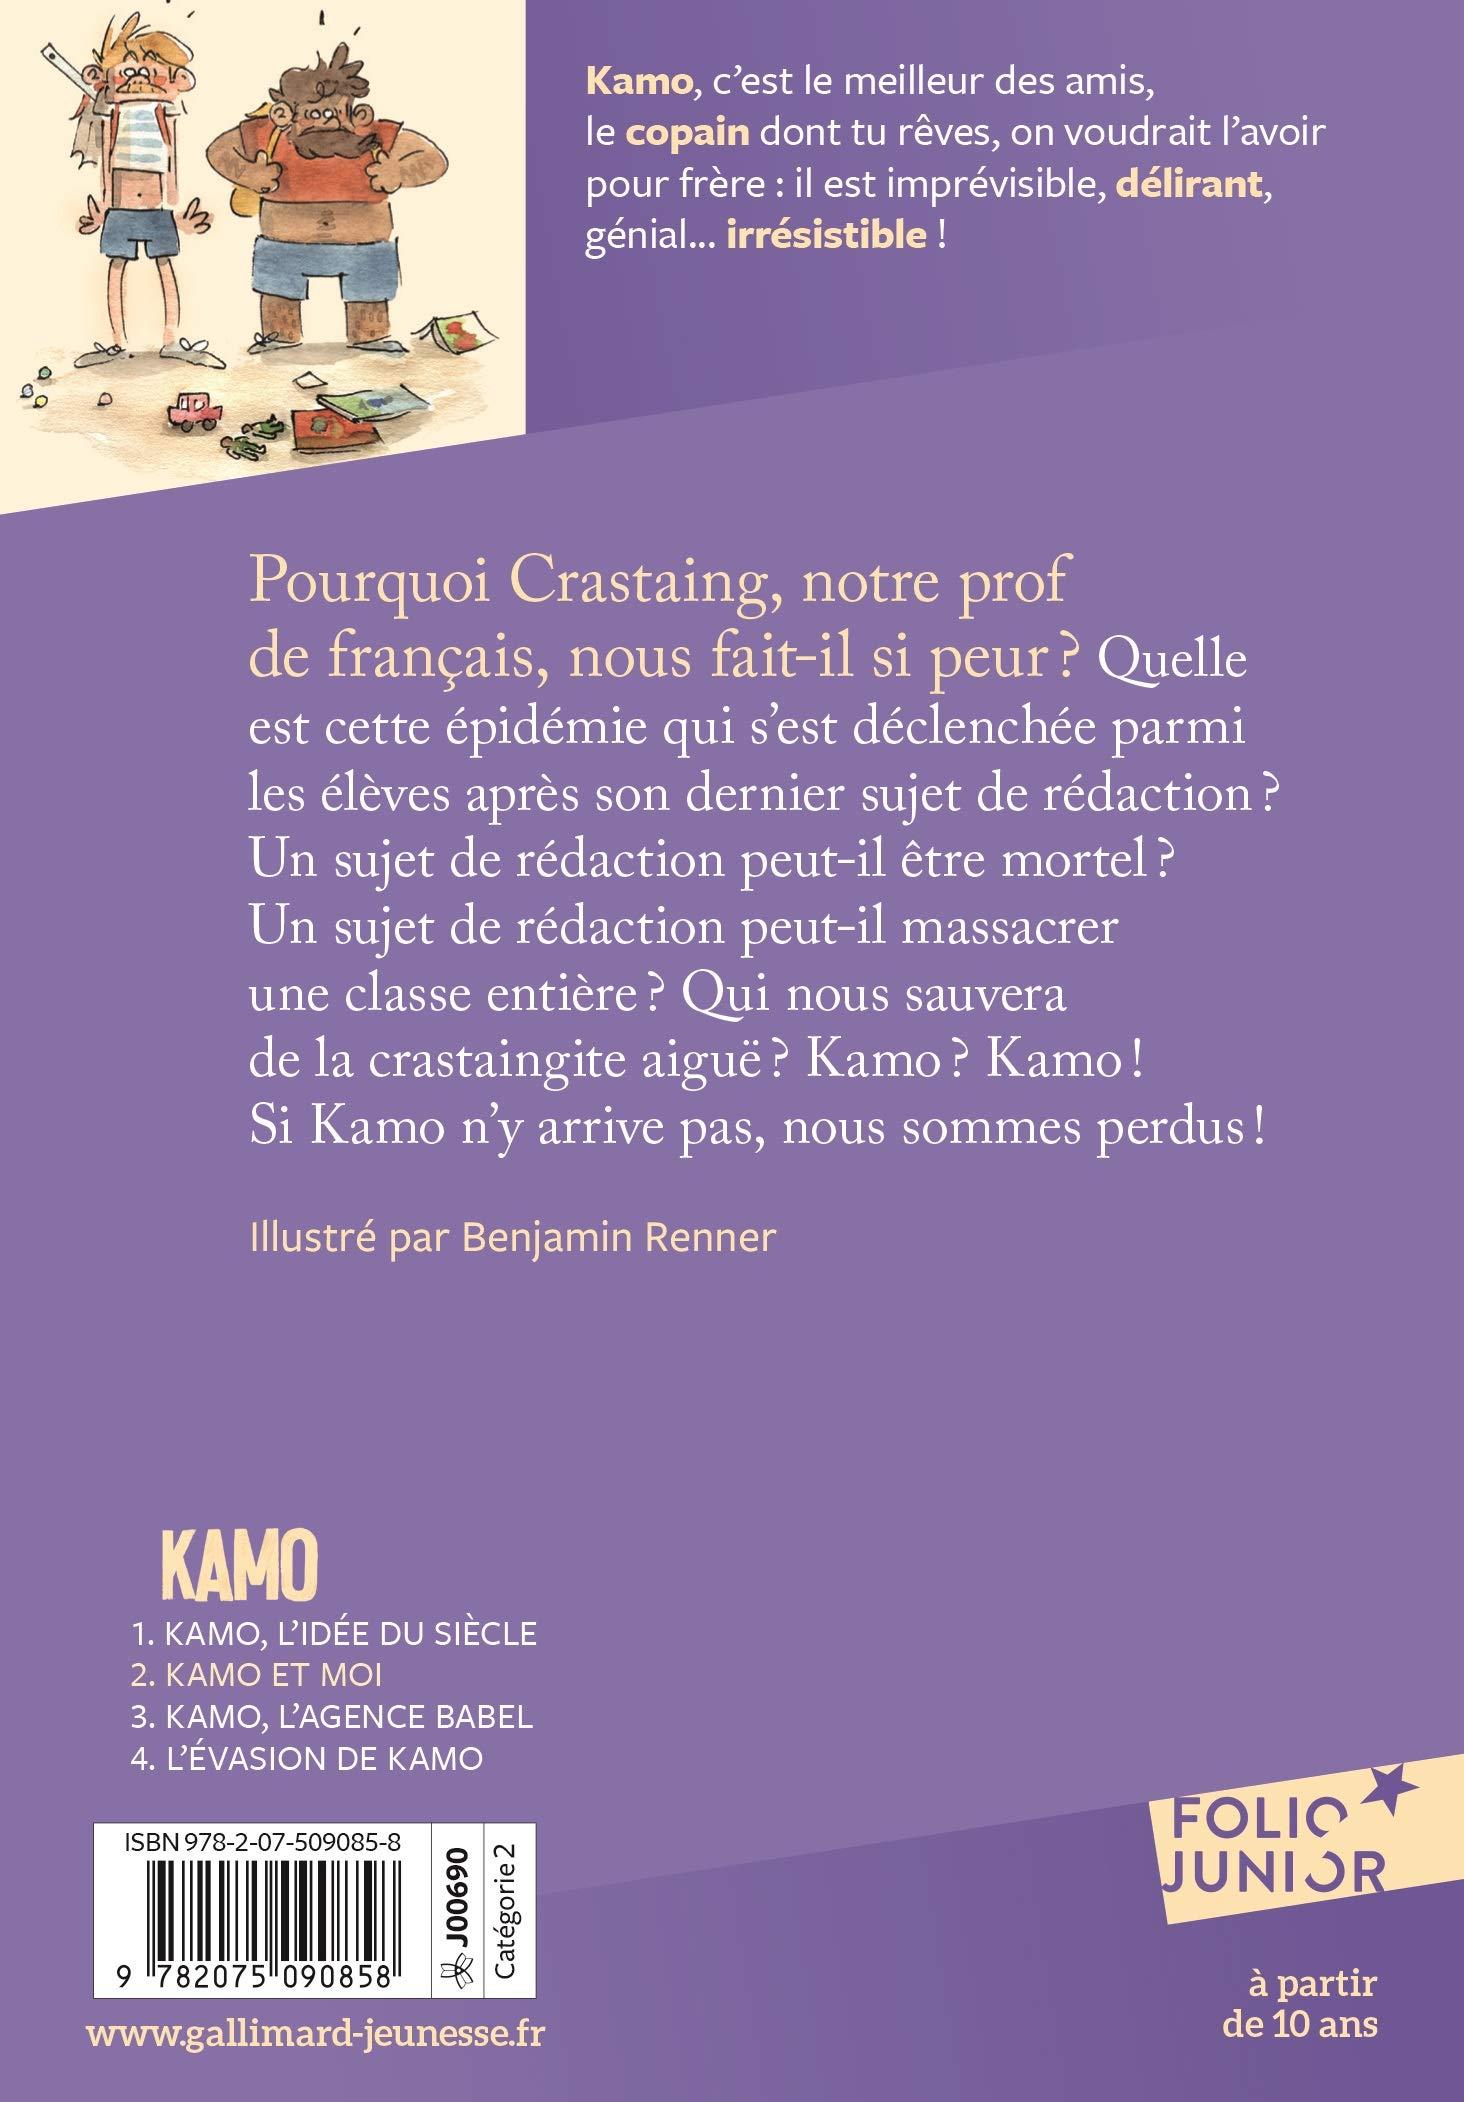 Amazon.fr - Une aventure de Kamo, 2 : Kamo et moi - Daniel Pennac, Benjamin  Renner - Livres